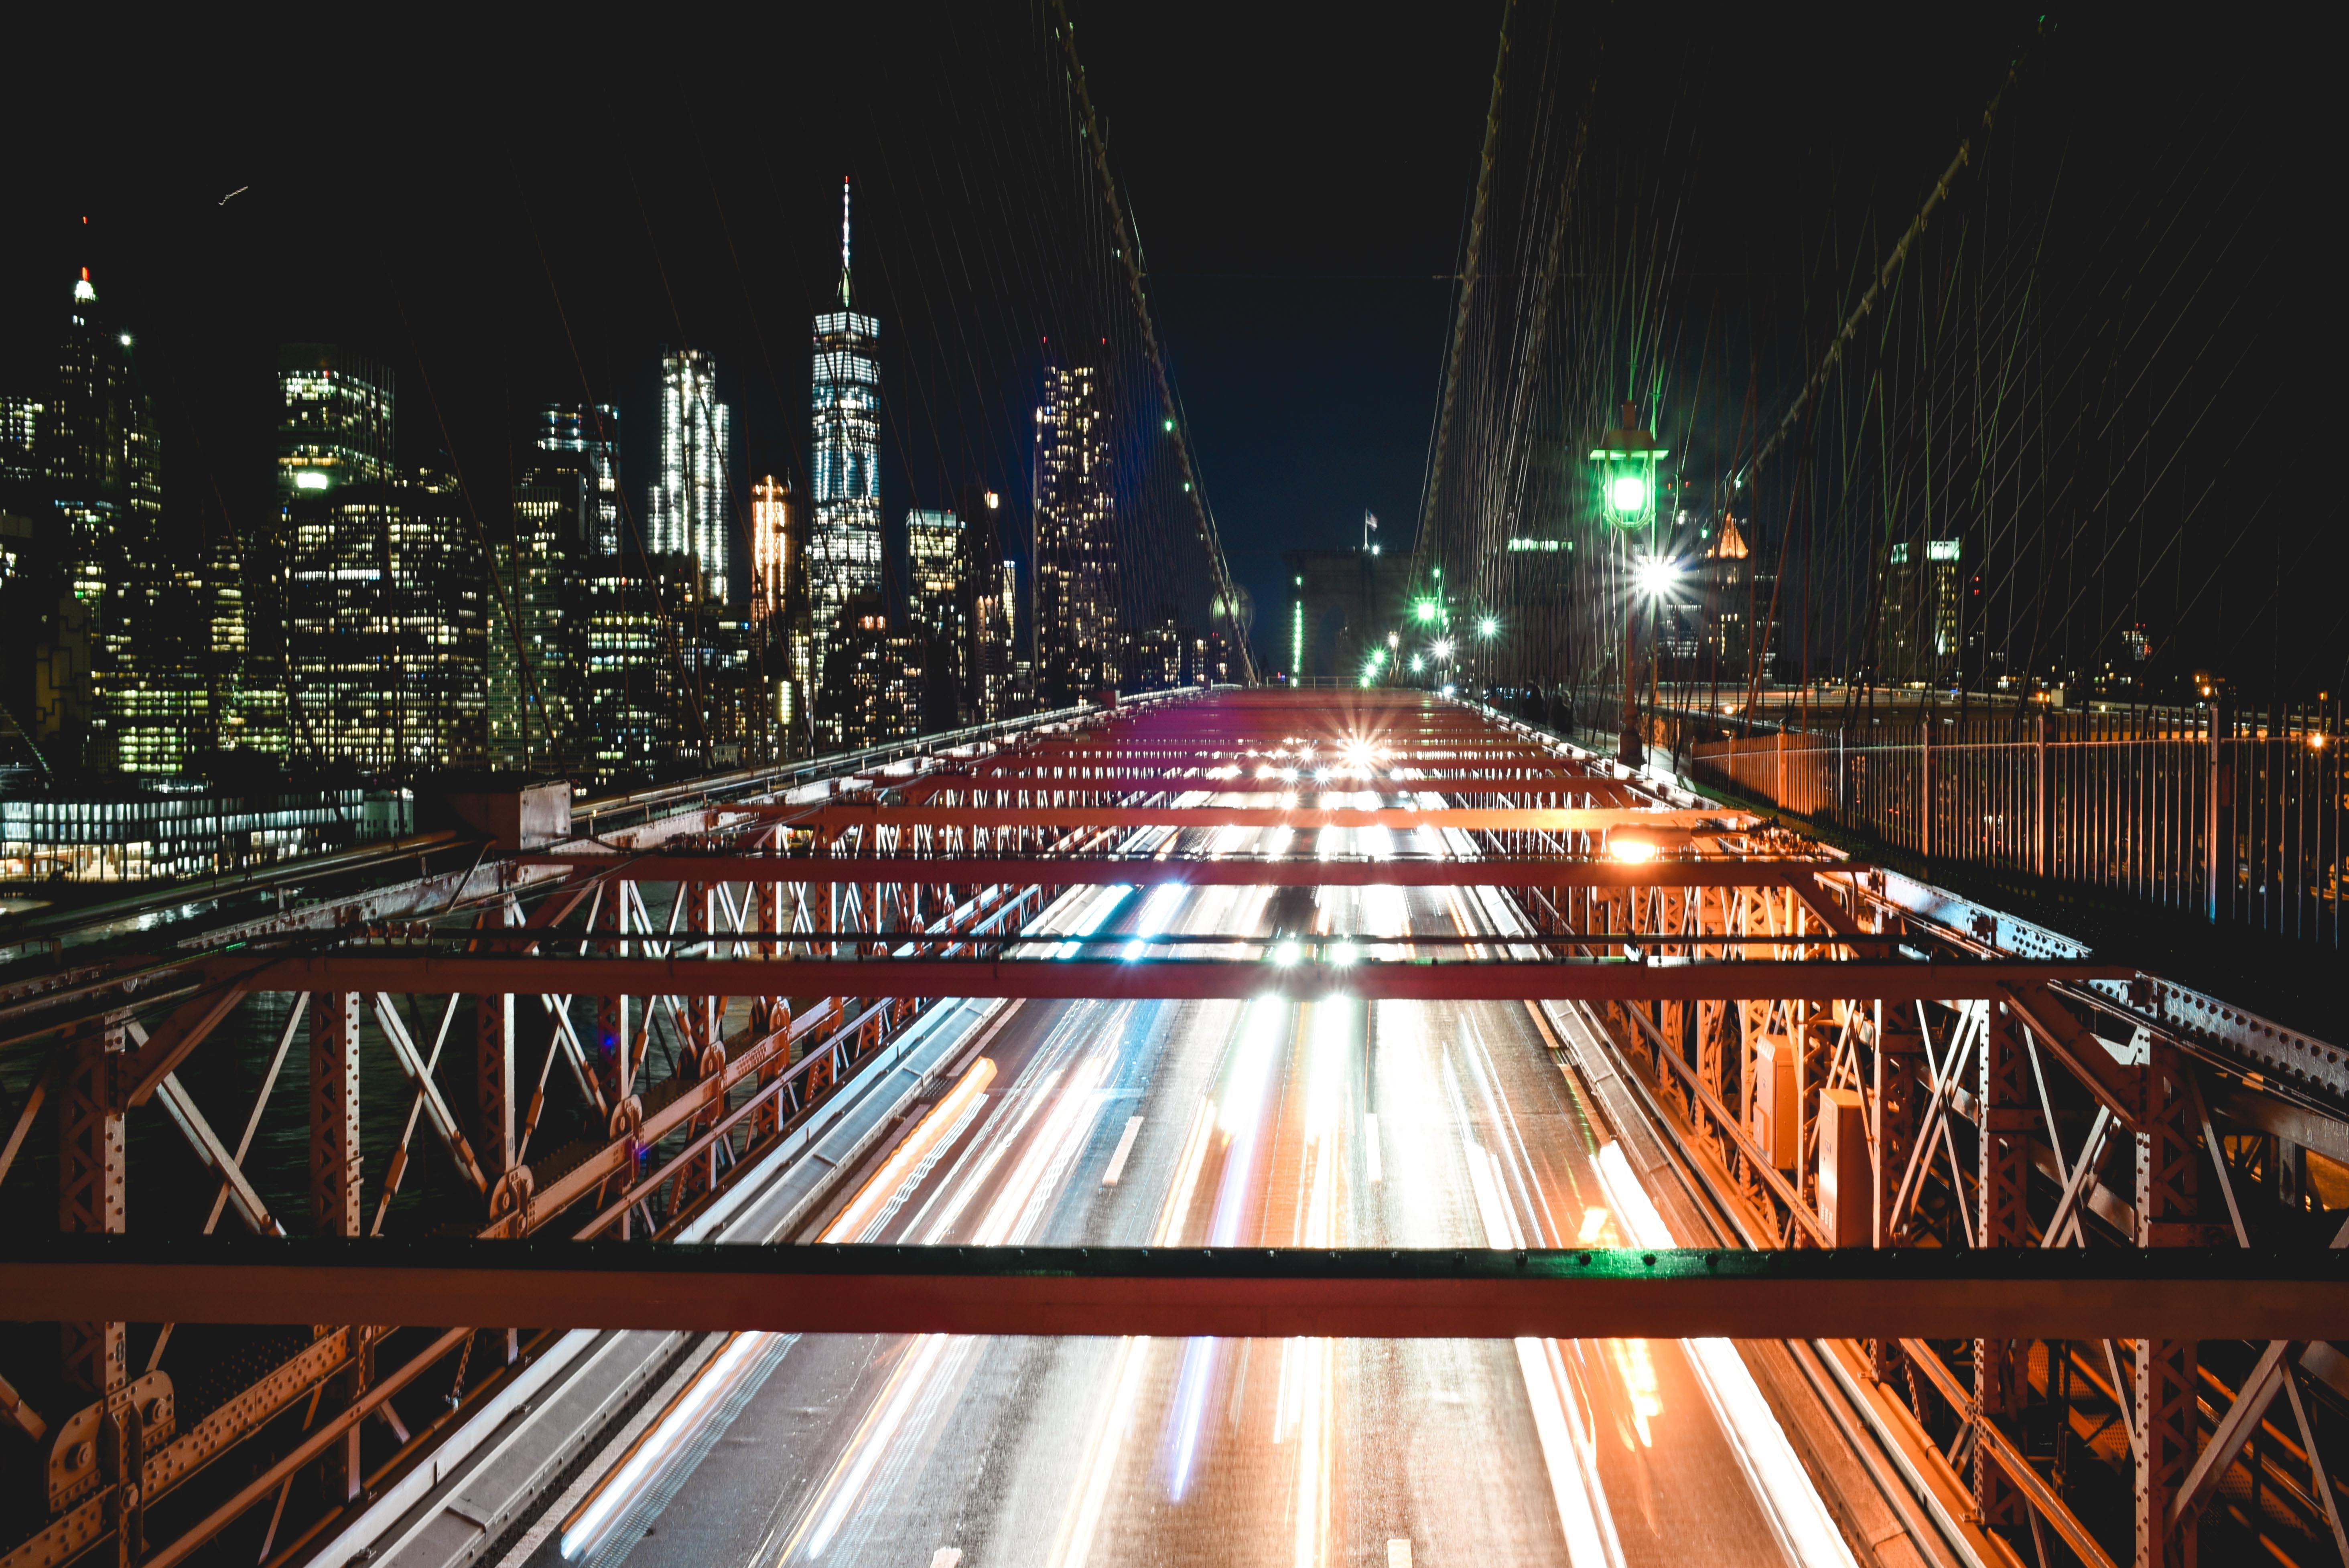 time lapse photography of moving vehicles on bridge